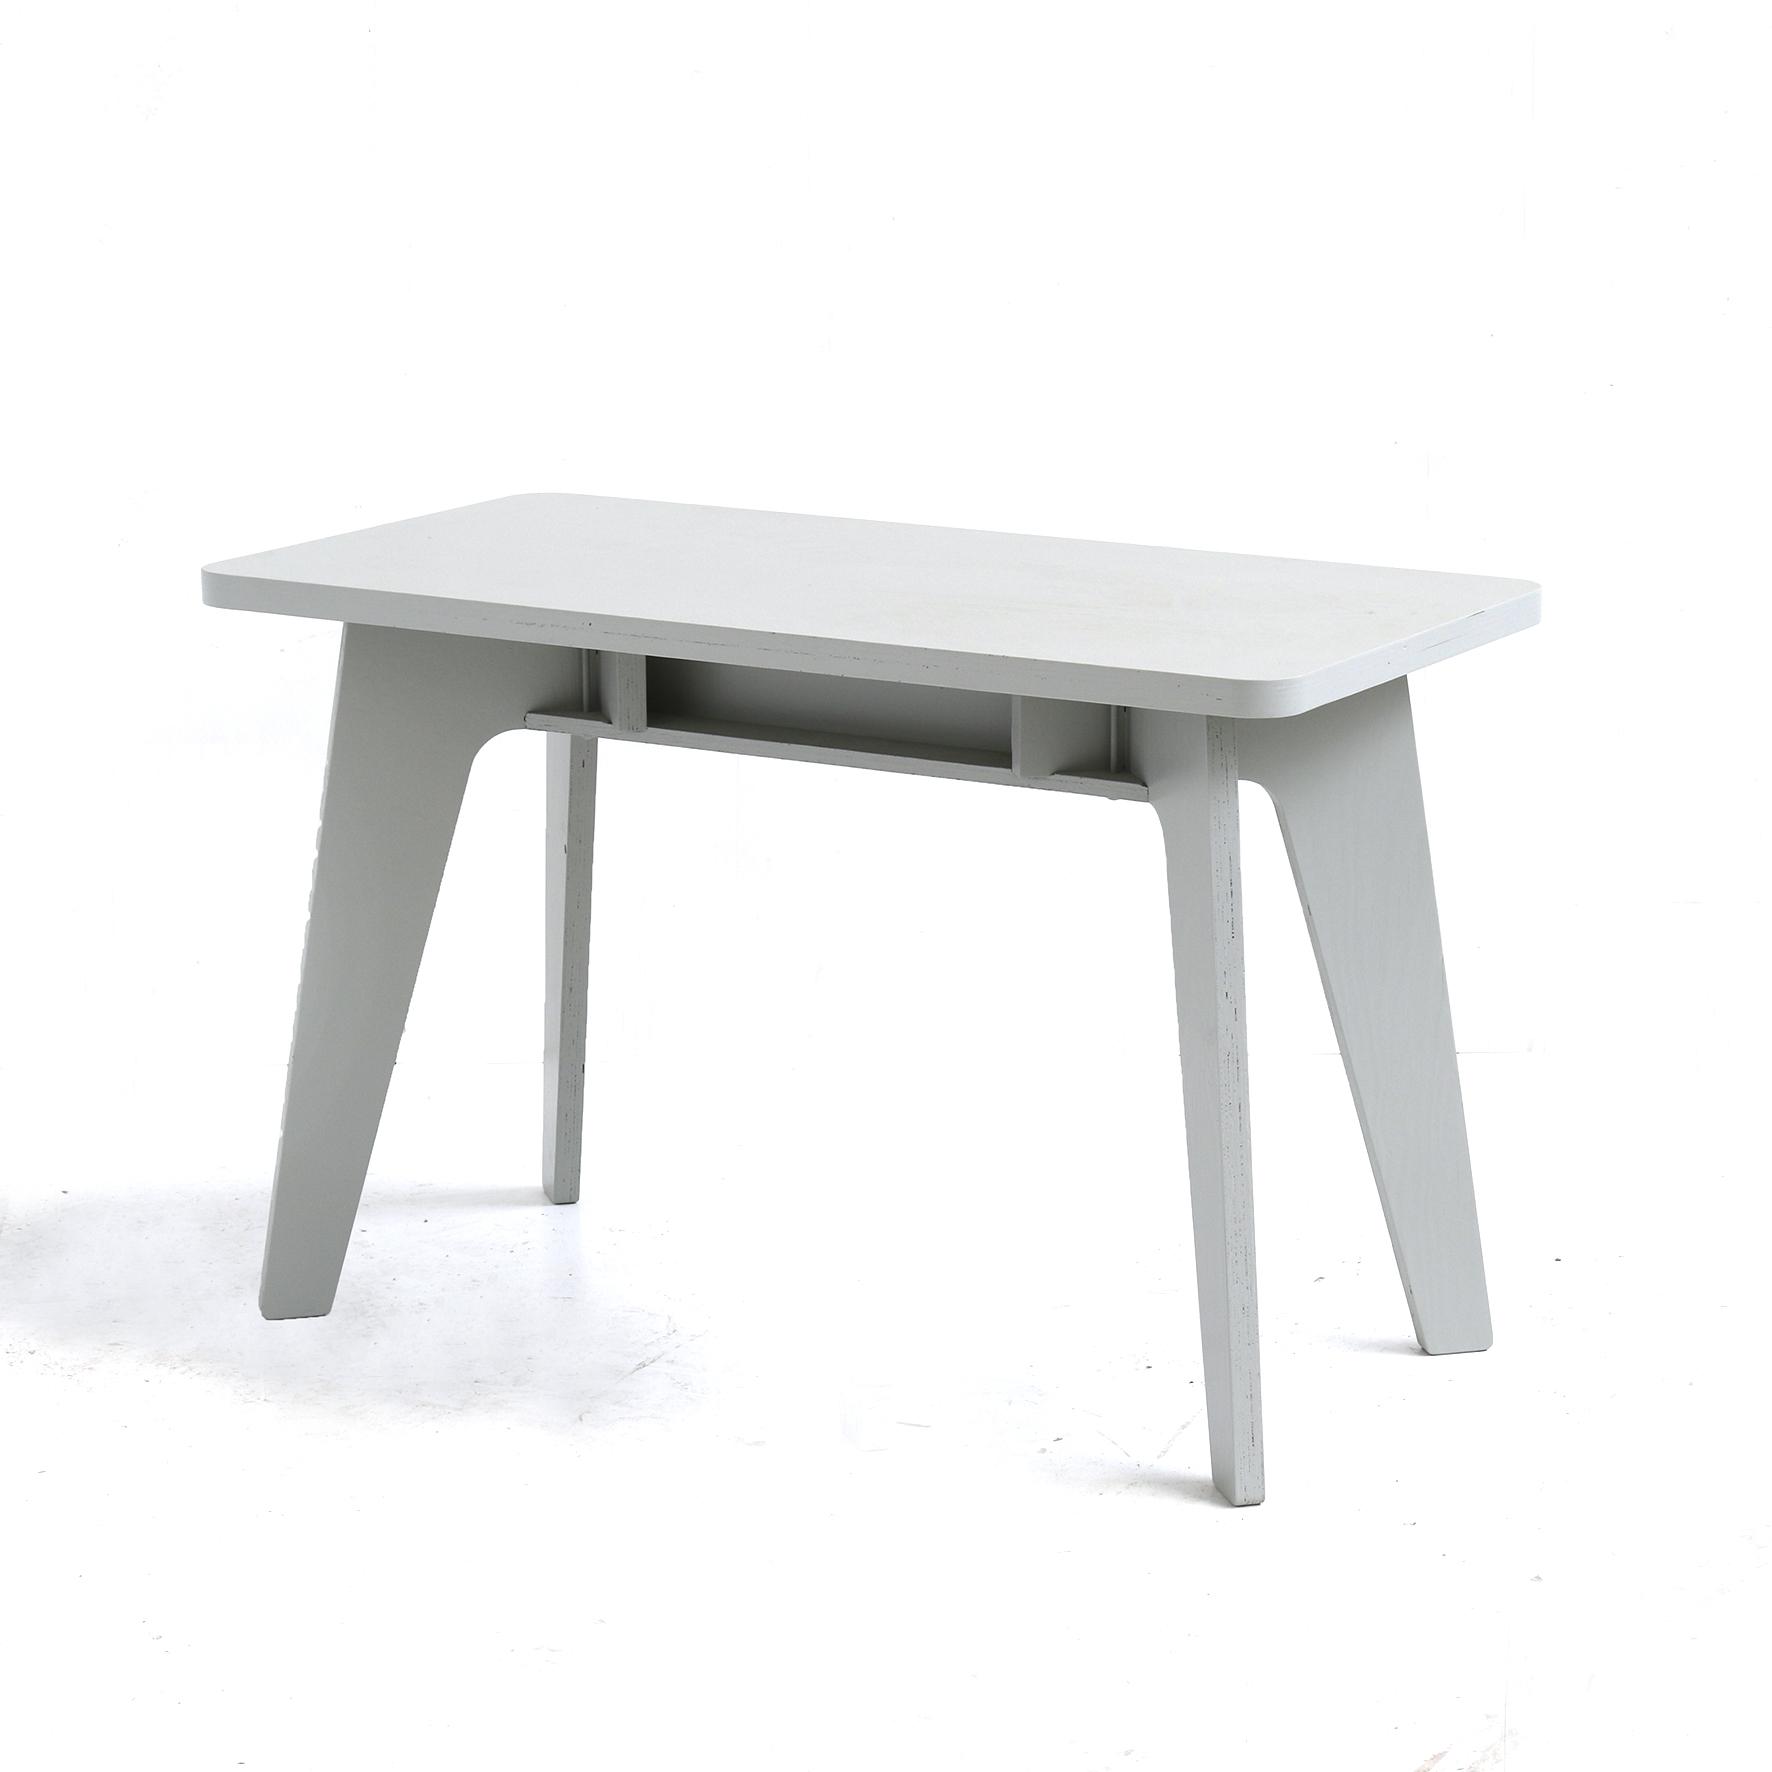 tafels  productcategorieën  piet hein eek, Meubels Ideeën